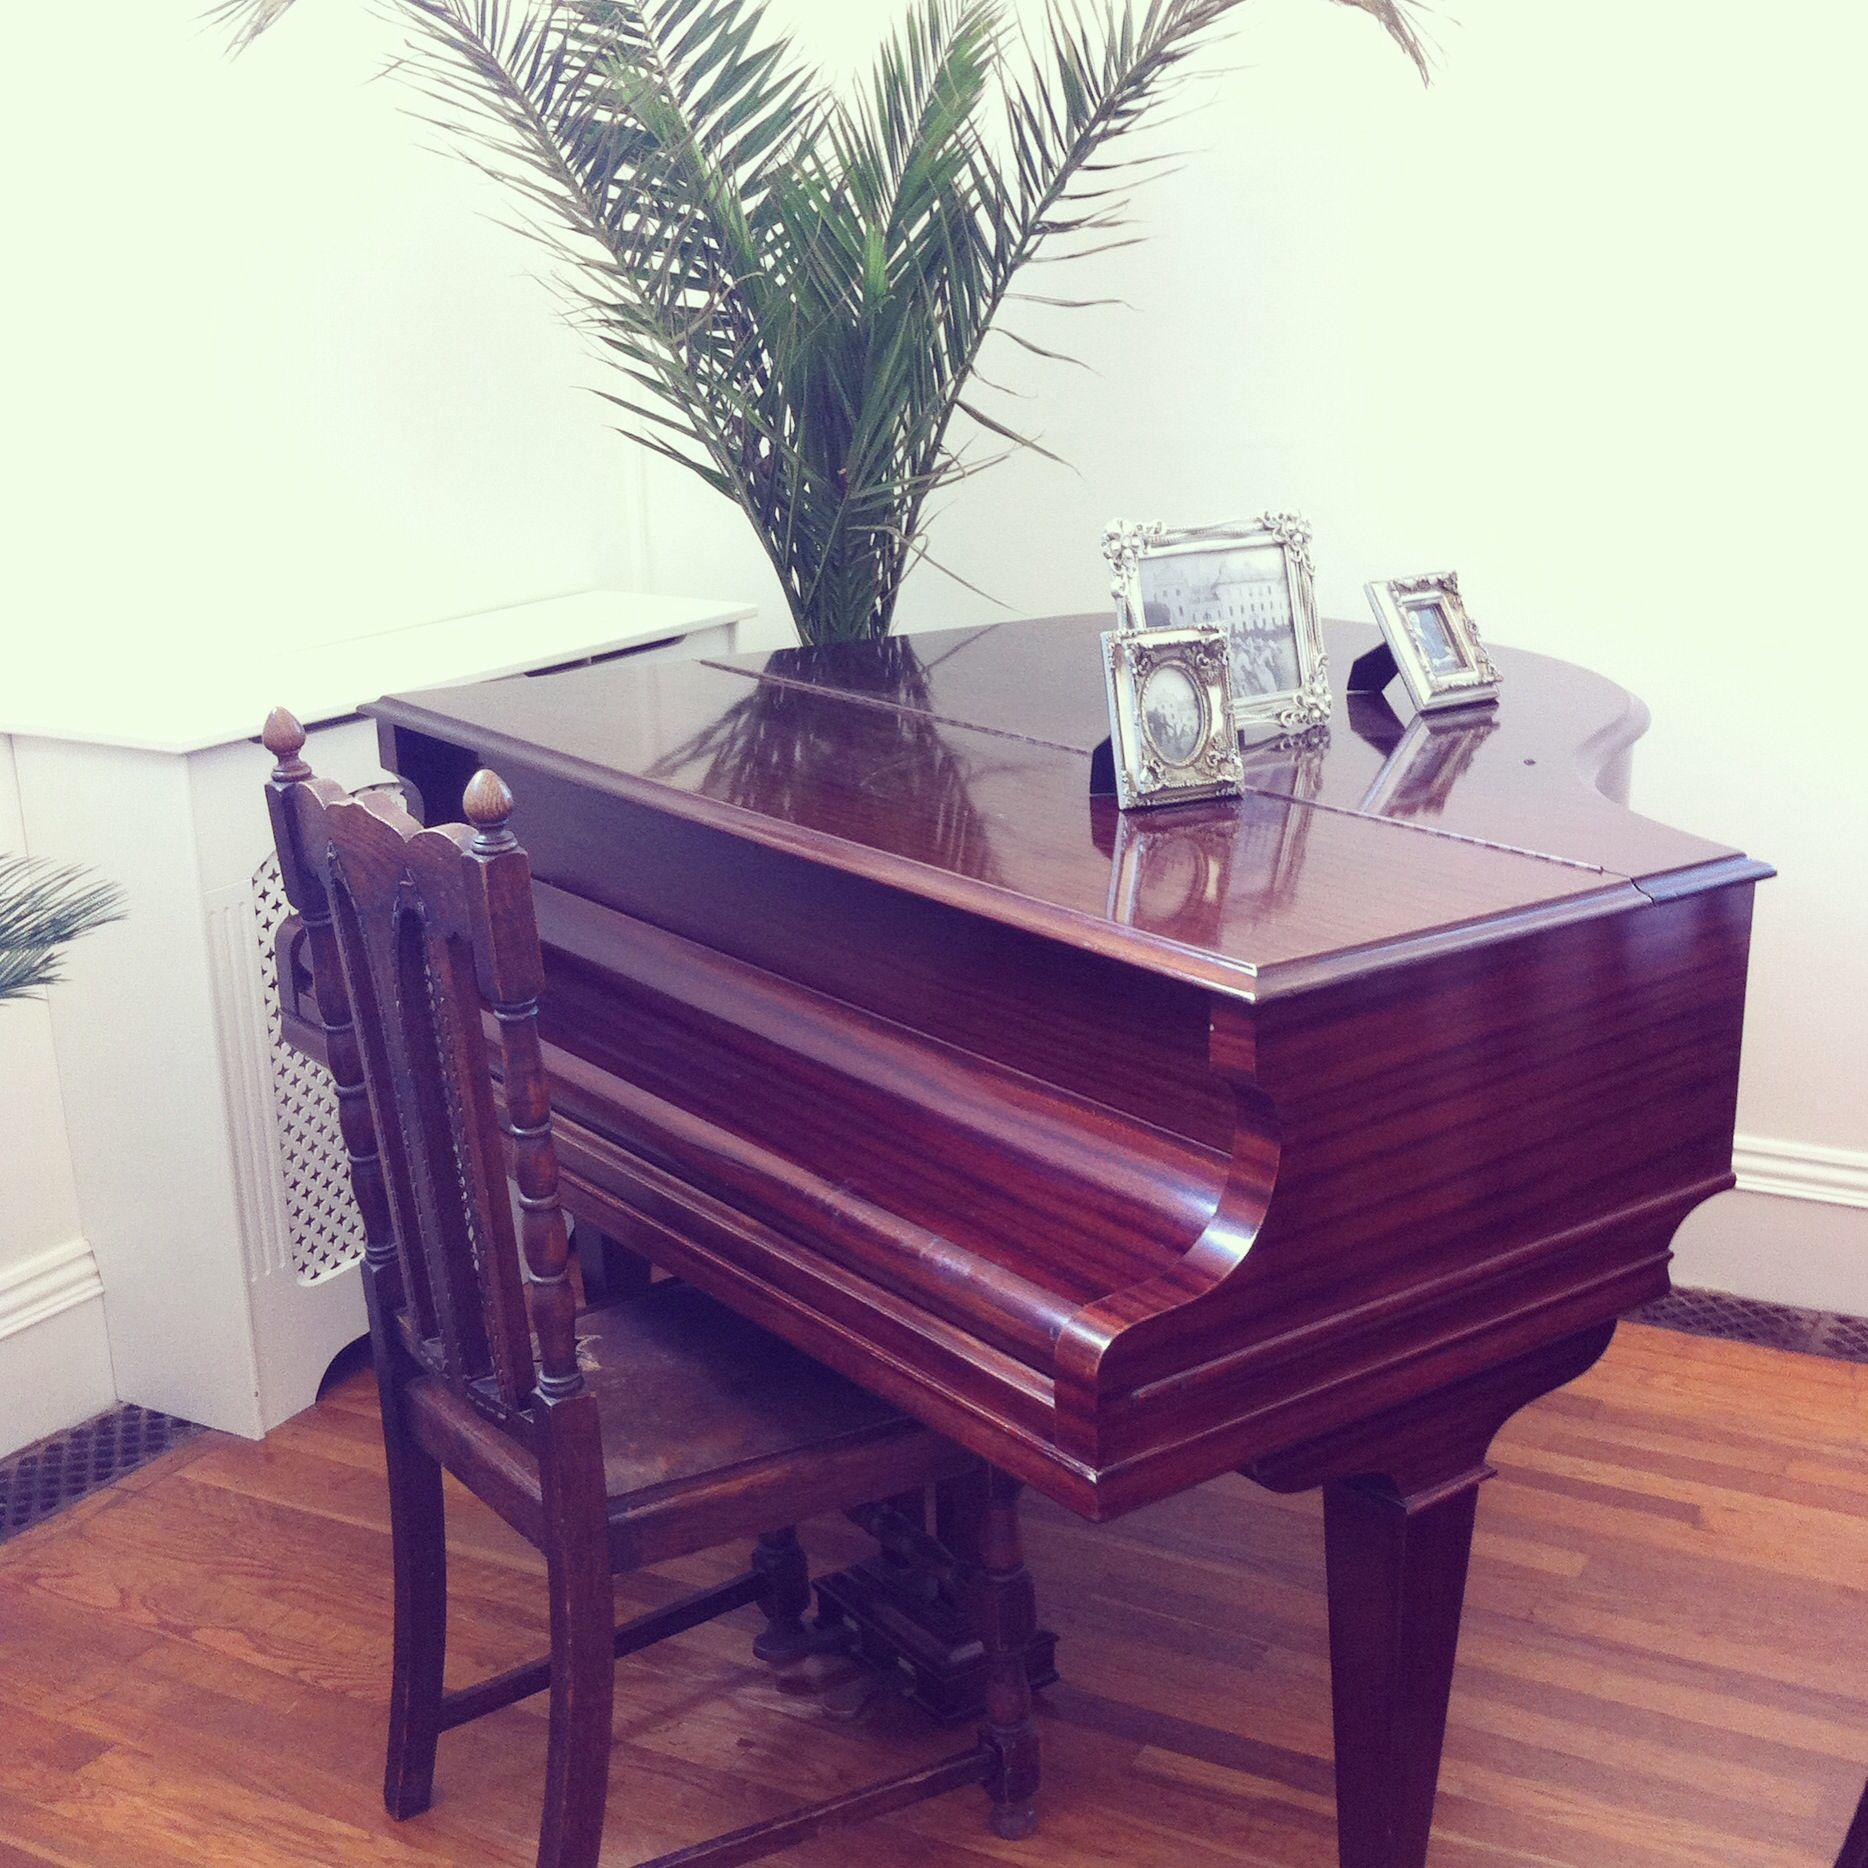 Piano in the new tearoom. Afternoon tea, Cream tea, Piano